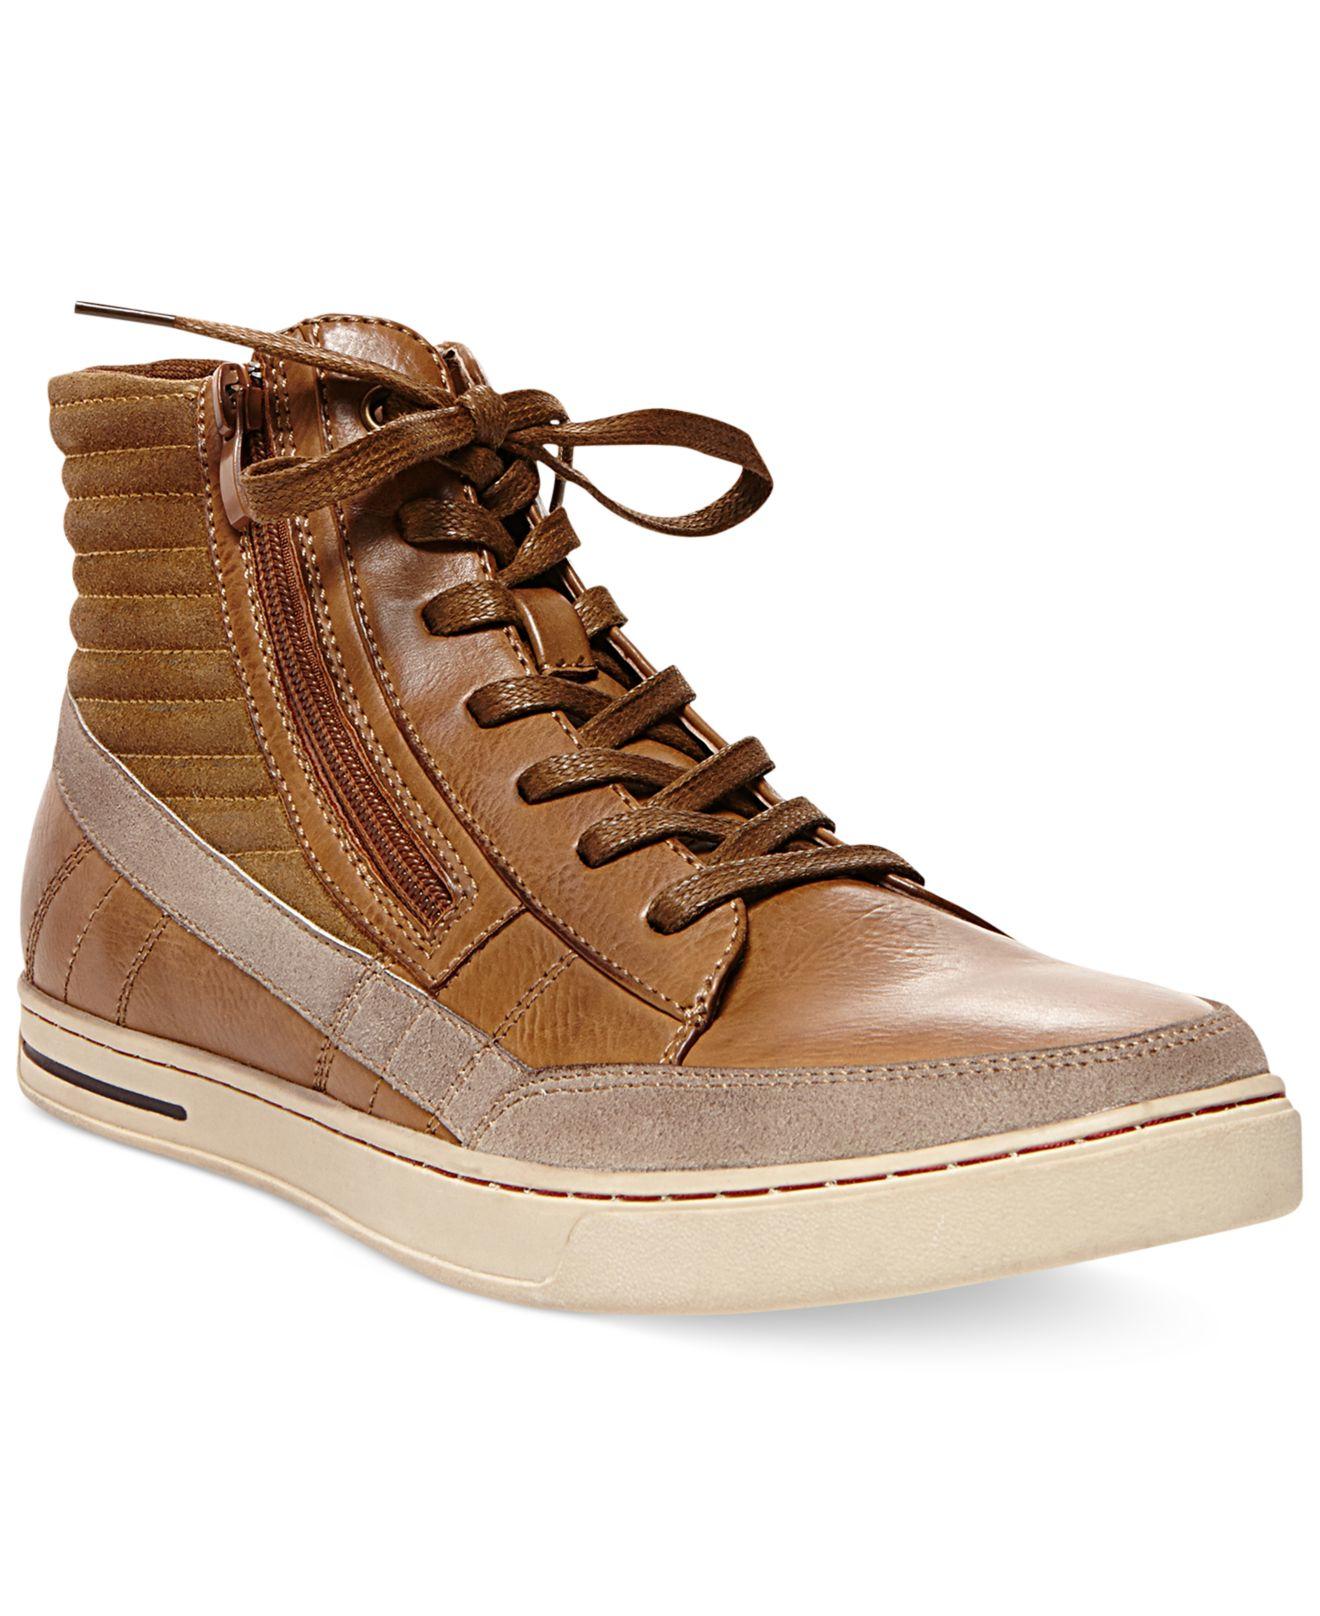 High Top Sneakers Steve Madden